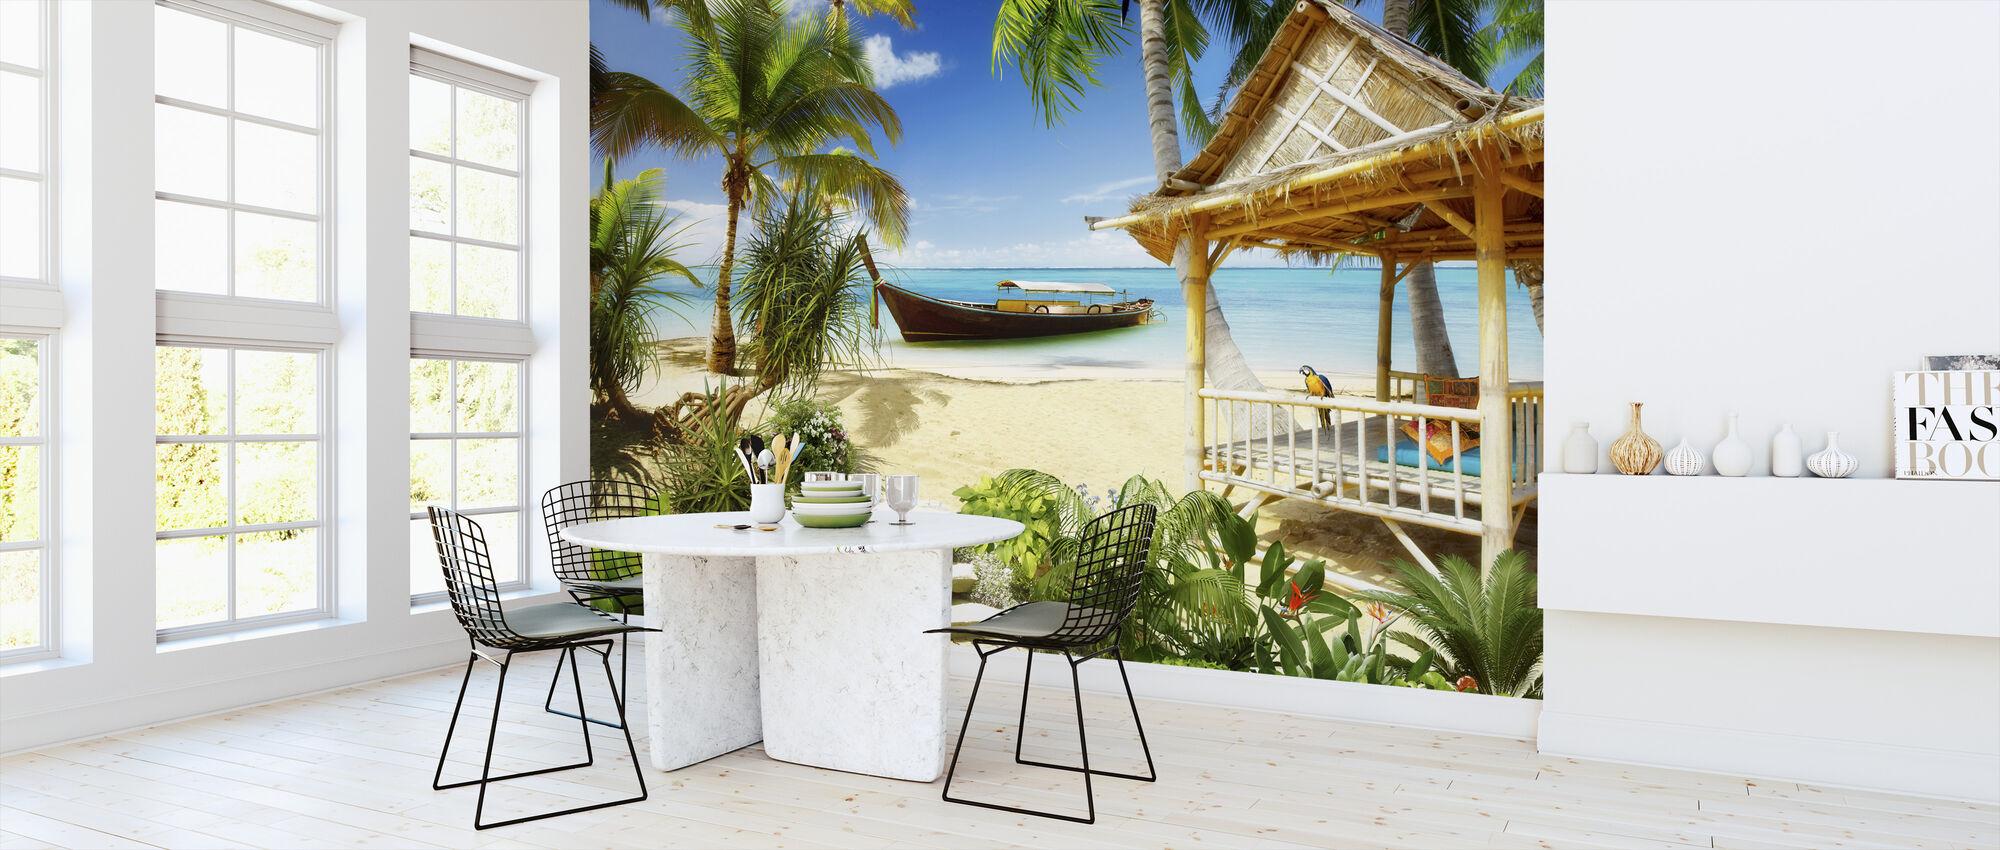 Retro Tropics - Wallpaper - Kitchen